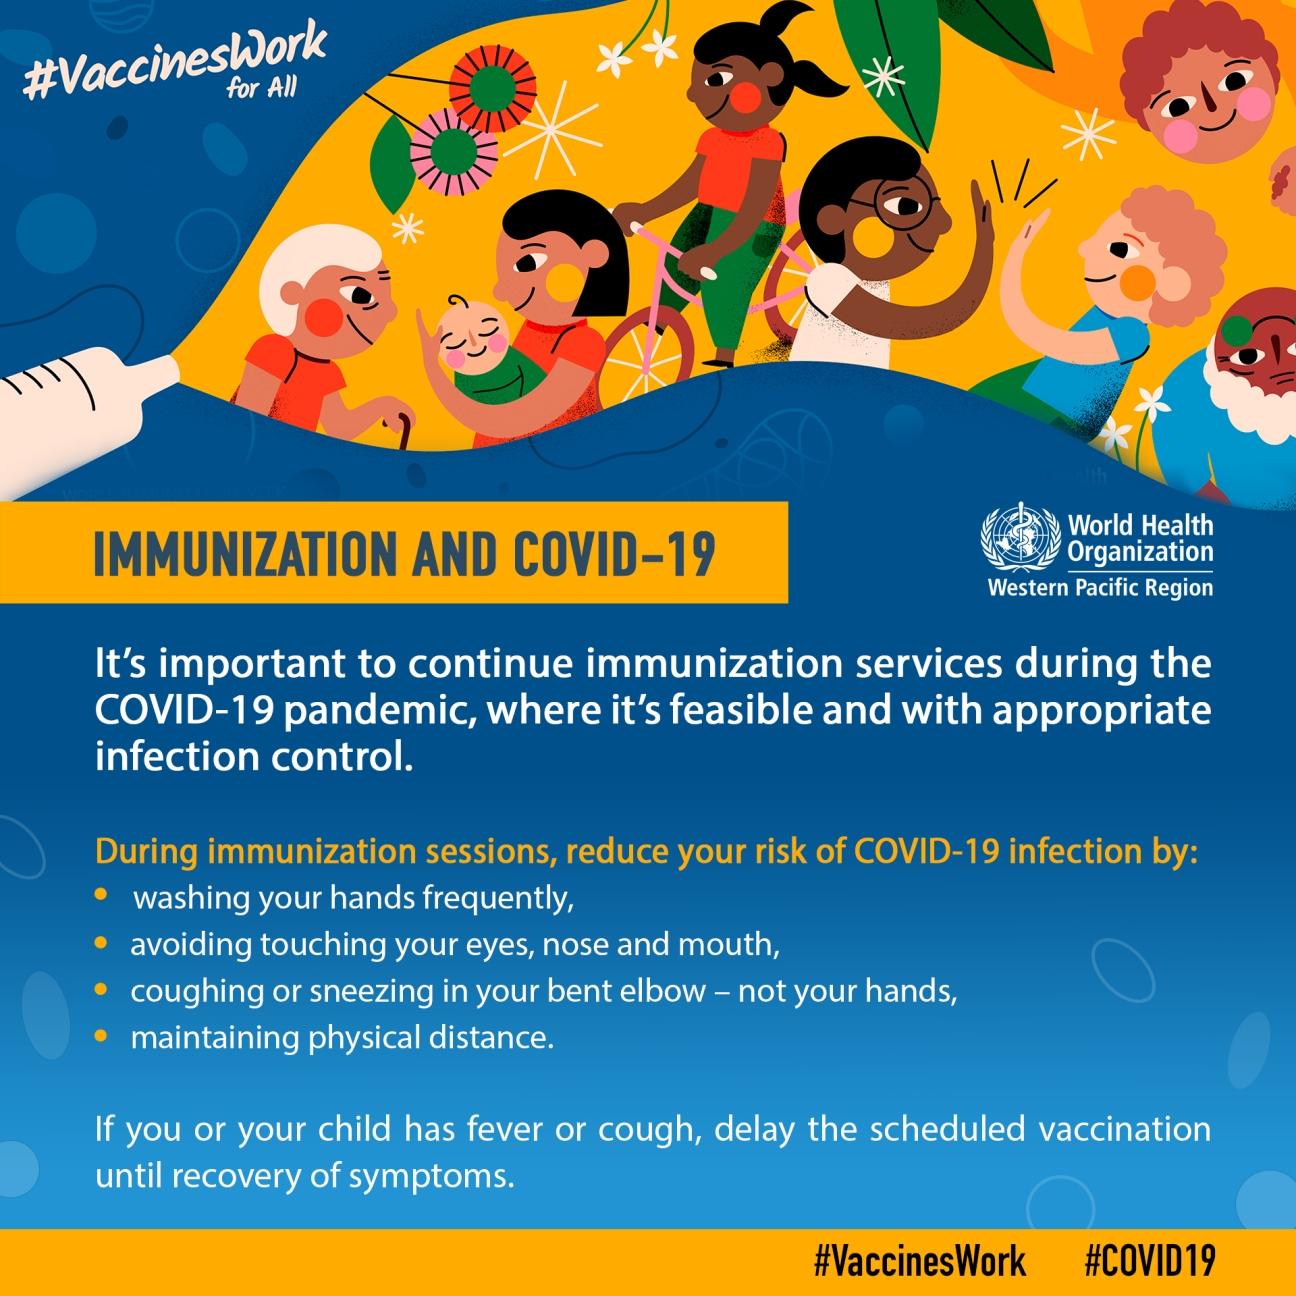 immunization-and-covid1_2